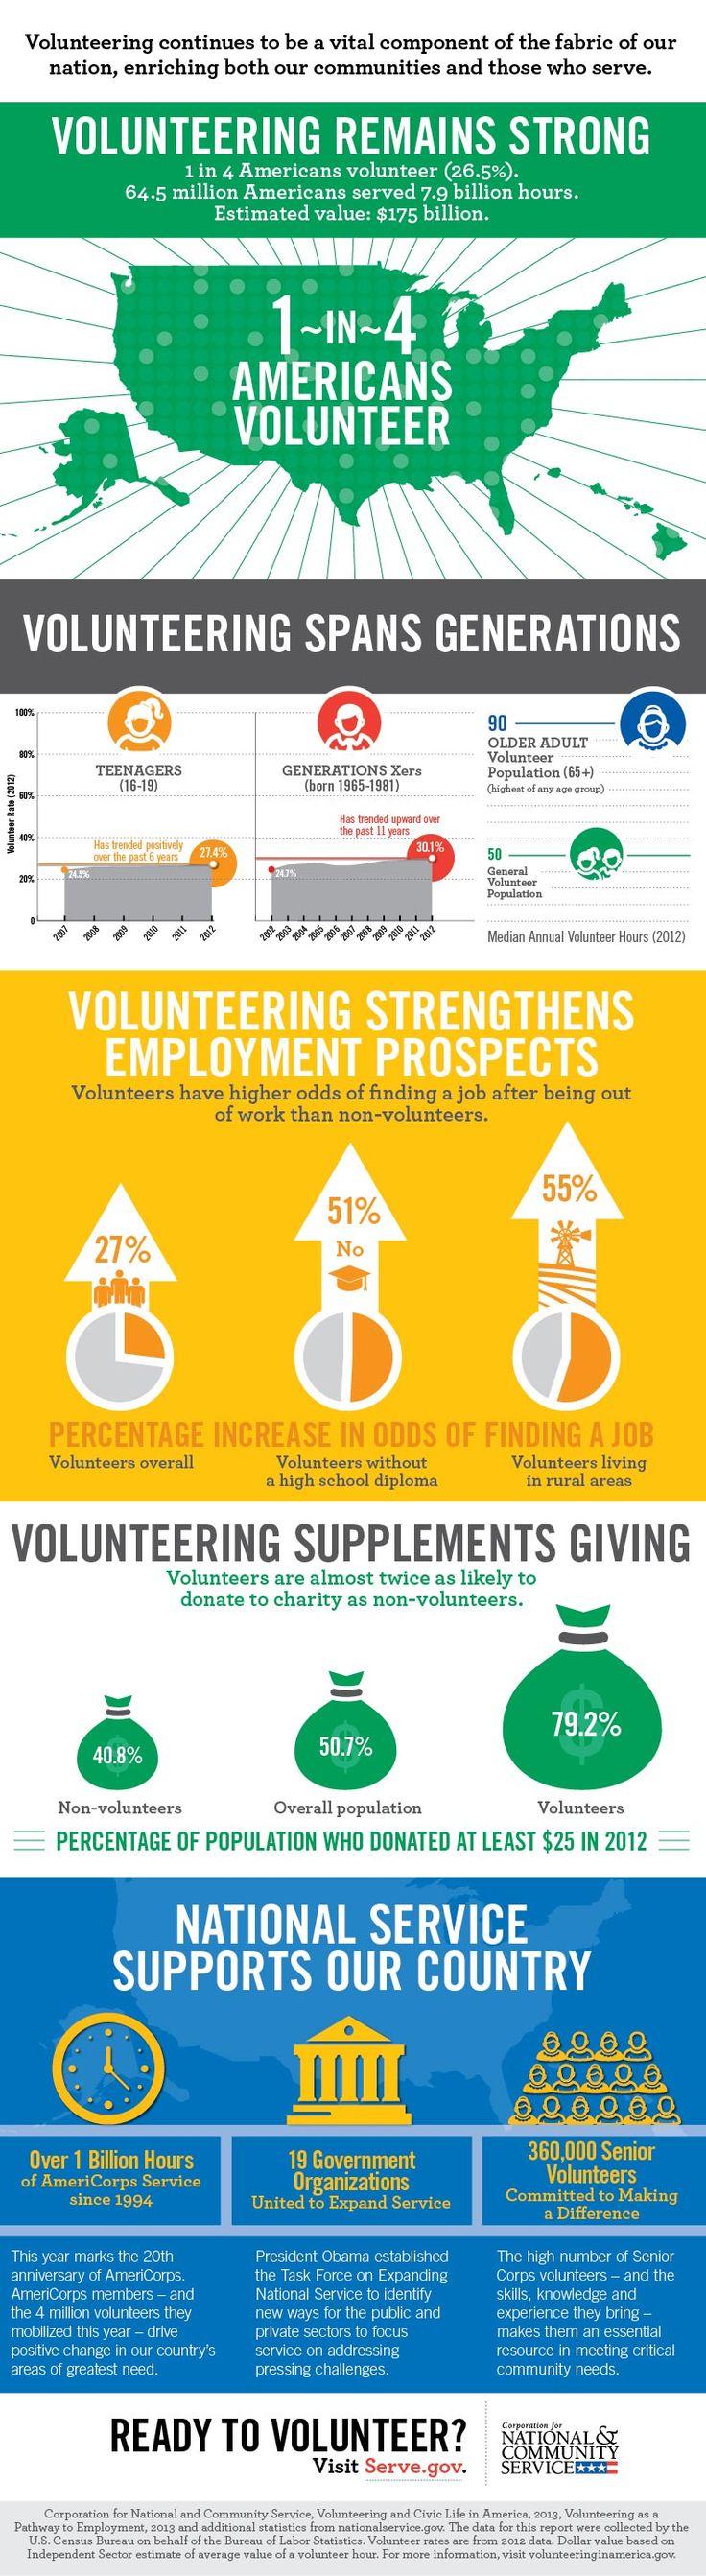 Fundraising and Grant Writing Volunteer